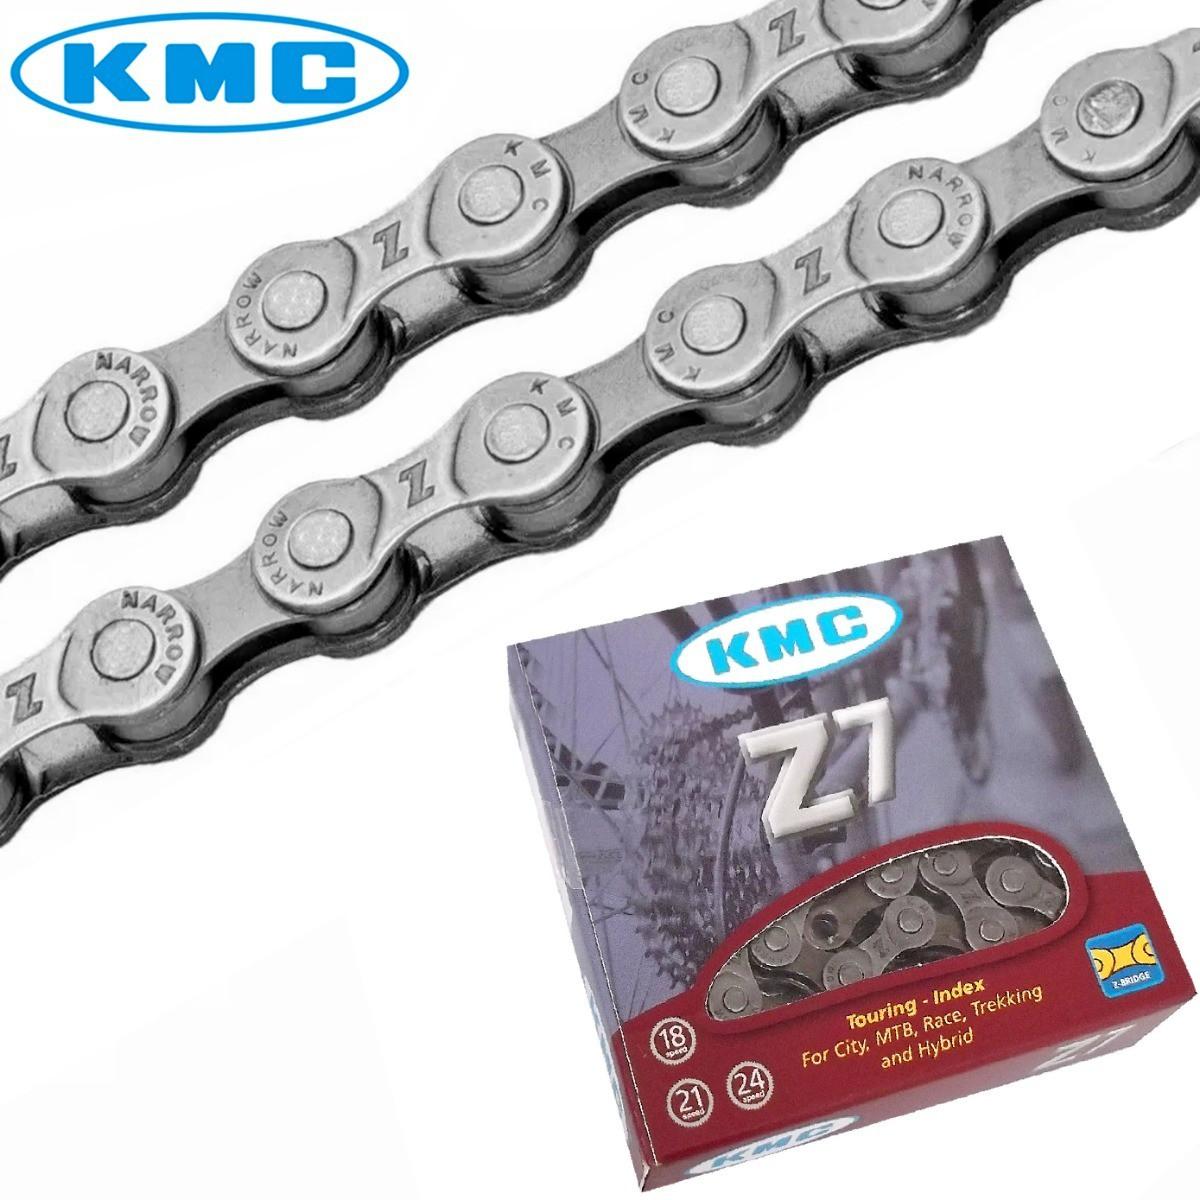 Corrente Kmc Z7 116 Elos